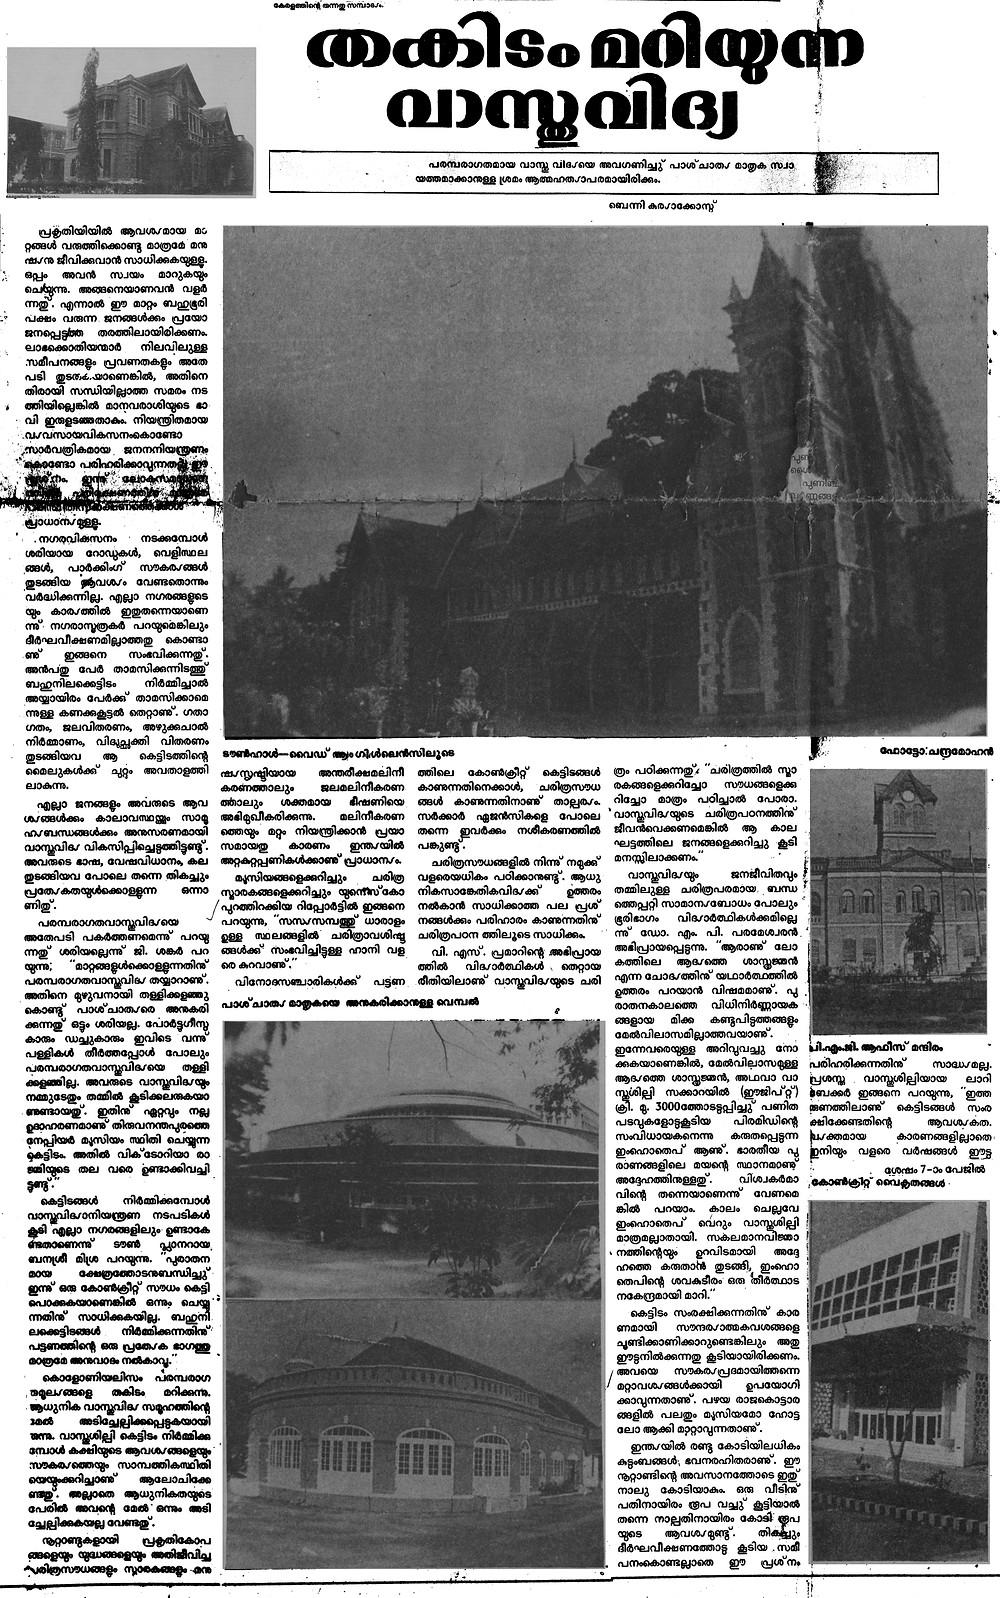 Kerala Kaumudi Weekend Magazine Article on Trivandram Heritage Buildings by Benny Kuriakose